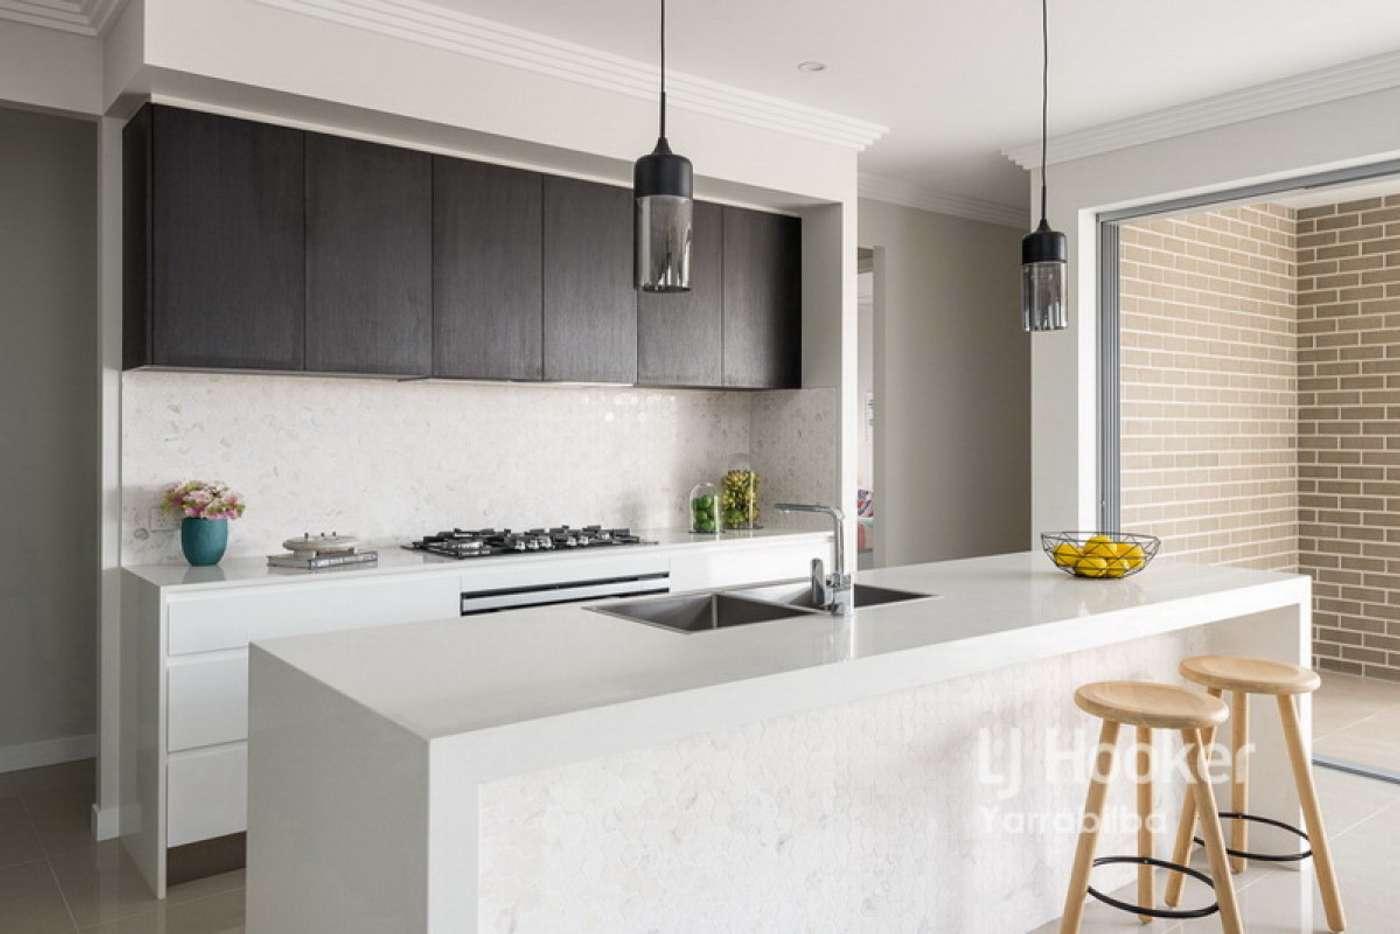 Main view of Homely house listing, 9 Mason Street, Yarrabilba QLD 4207